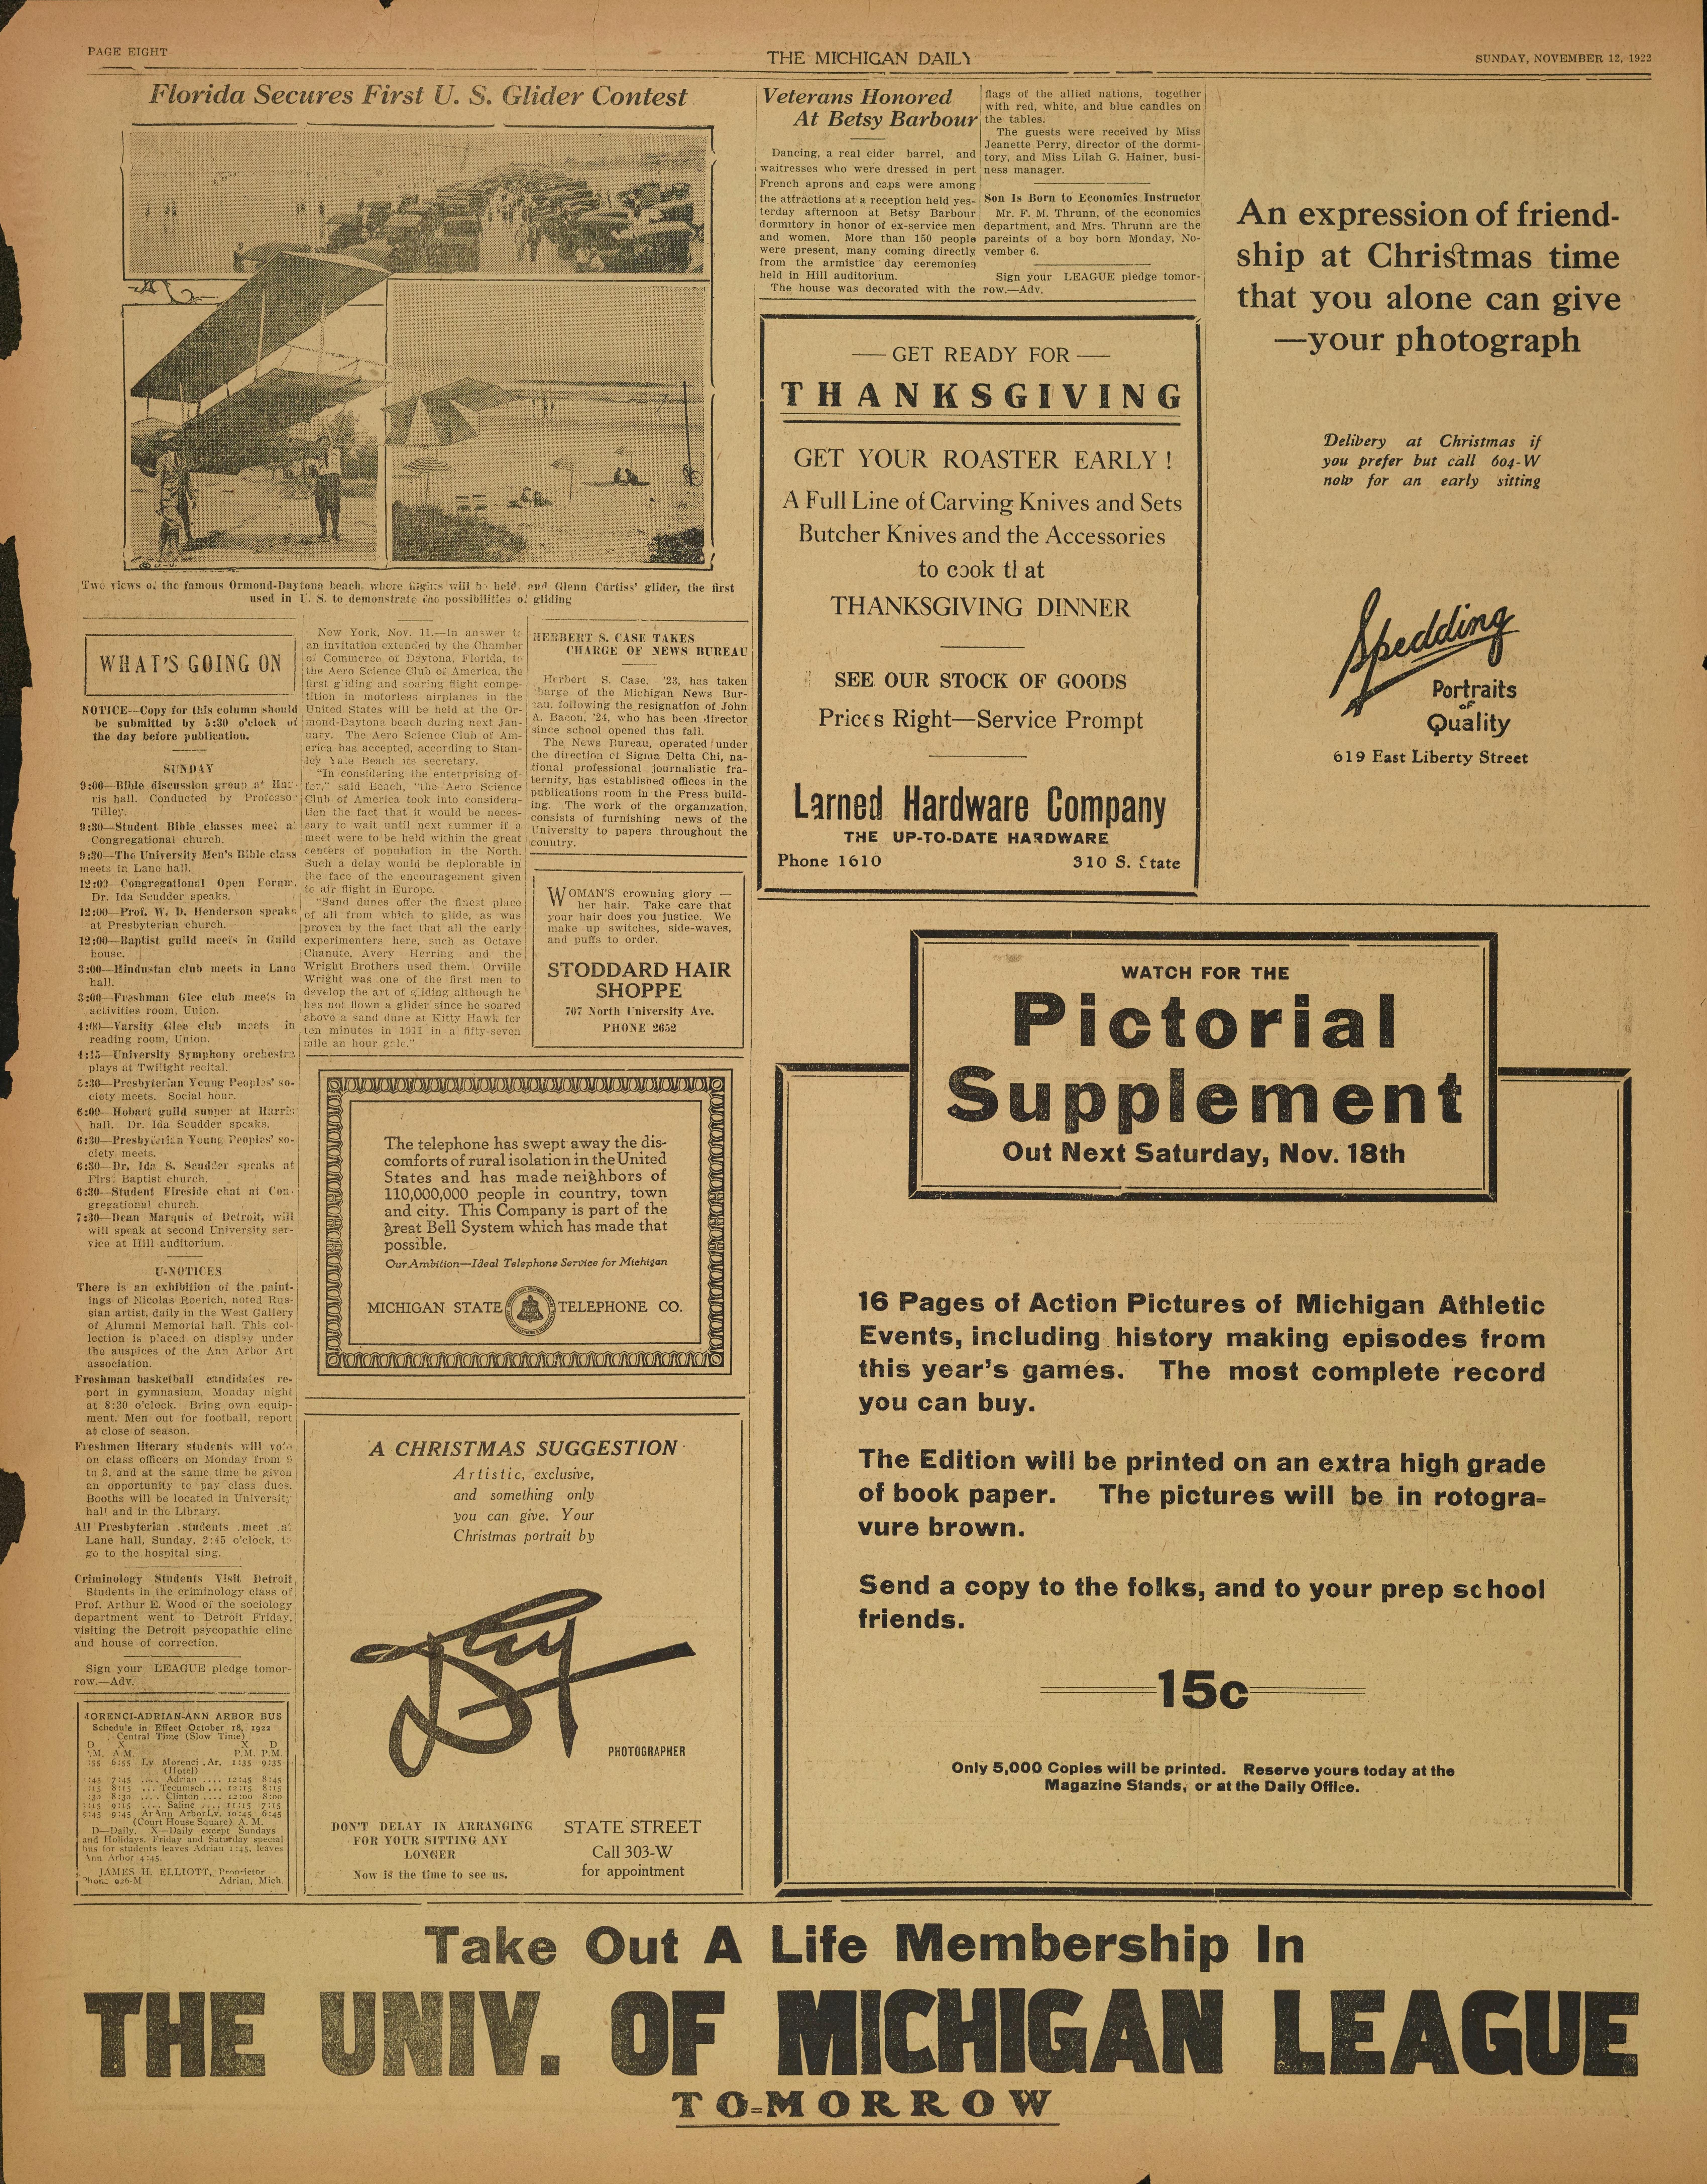 Michigan Daily Digital Archives - November 12, 1922 (vol  33, iss